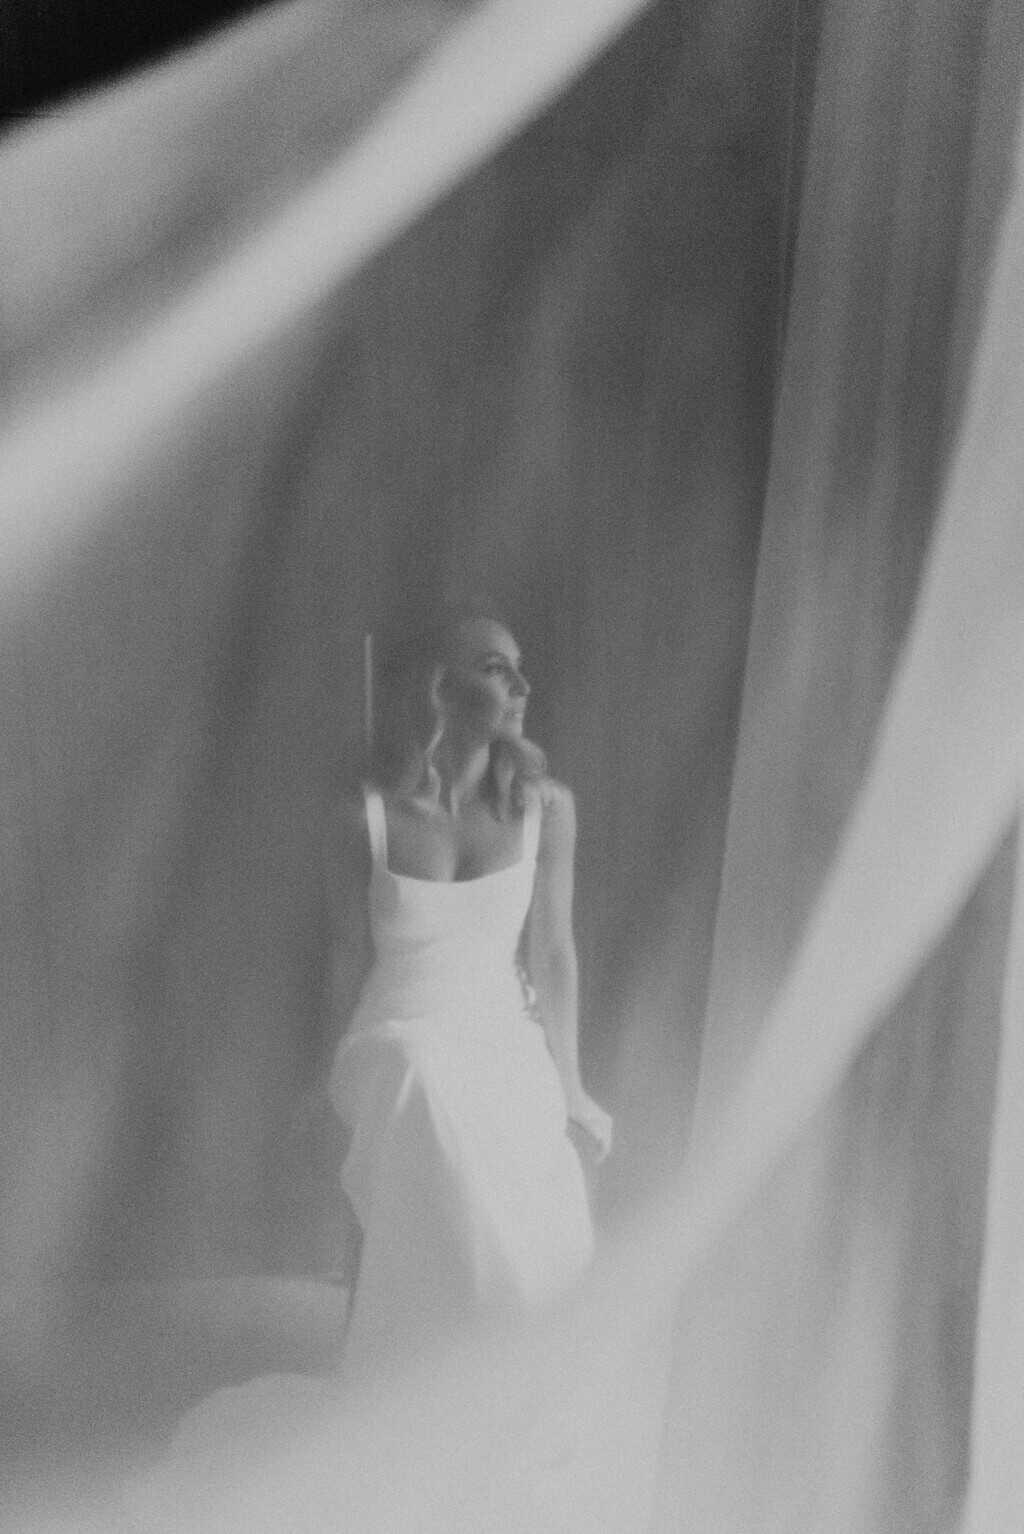 casamento-Maitê-e-Breno-Fotografia-Mana-Gollo-Hotel-Timbó-Park-making-of36